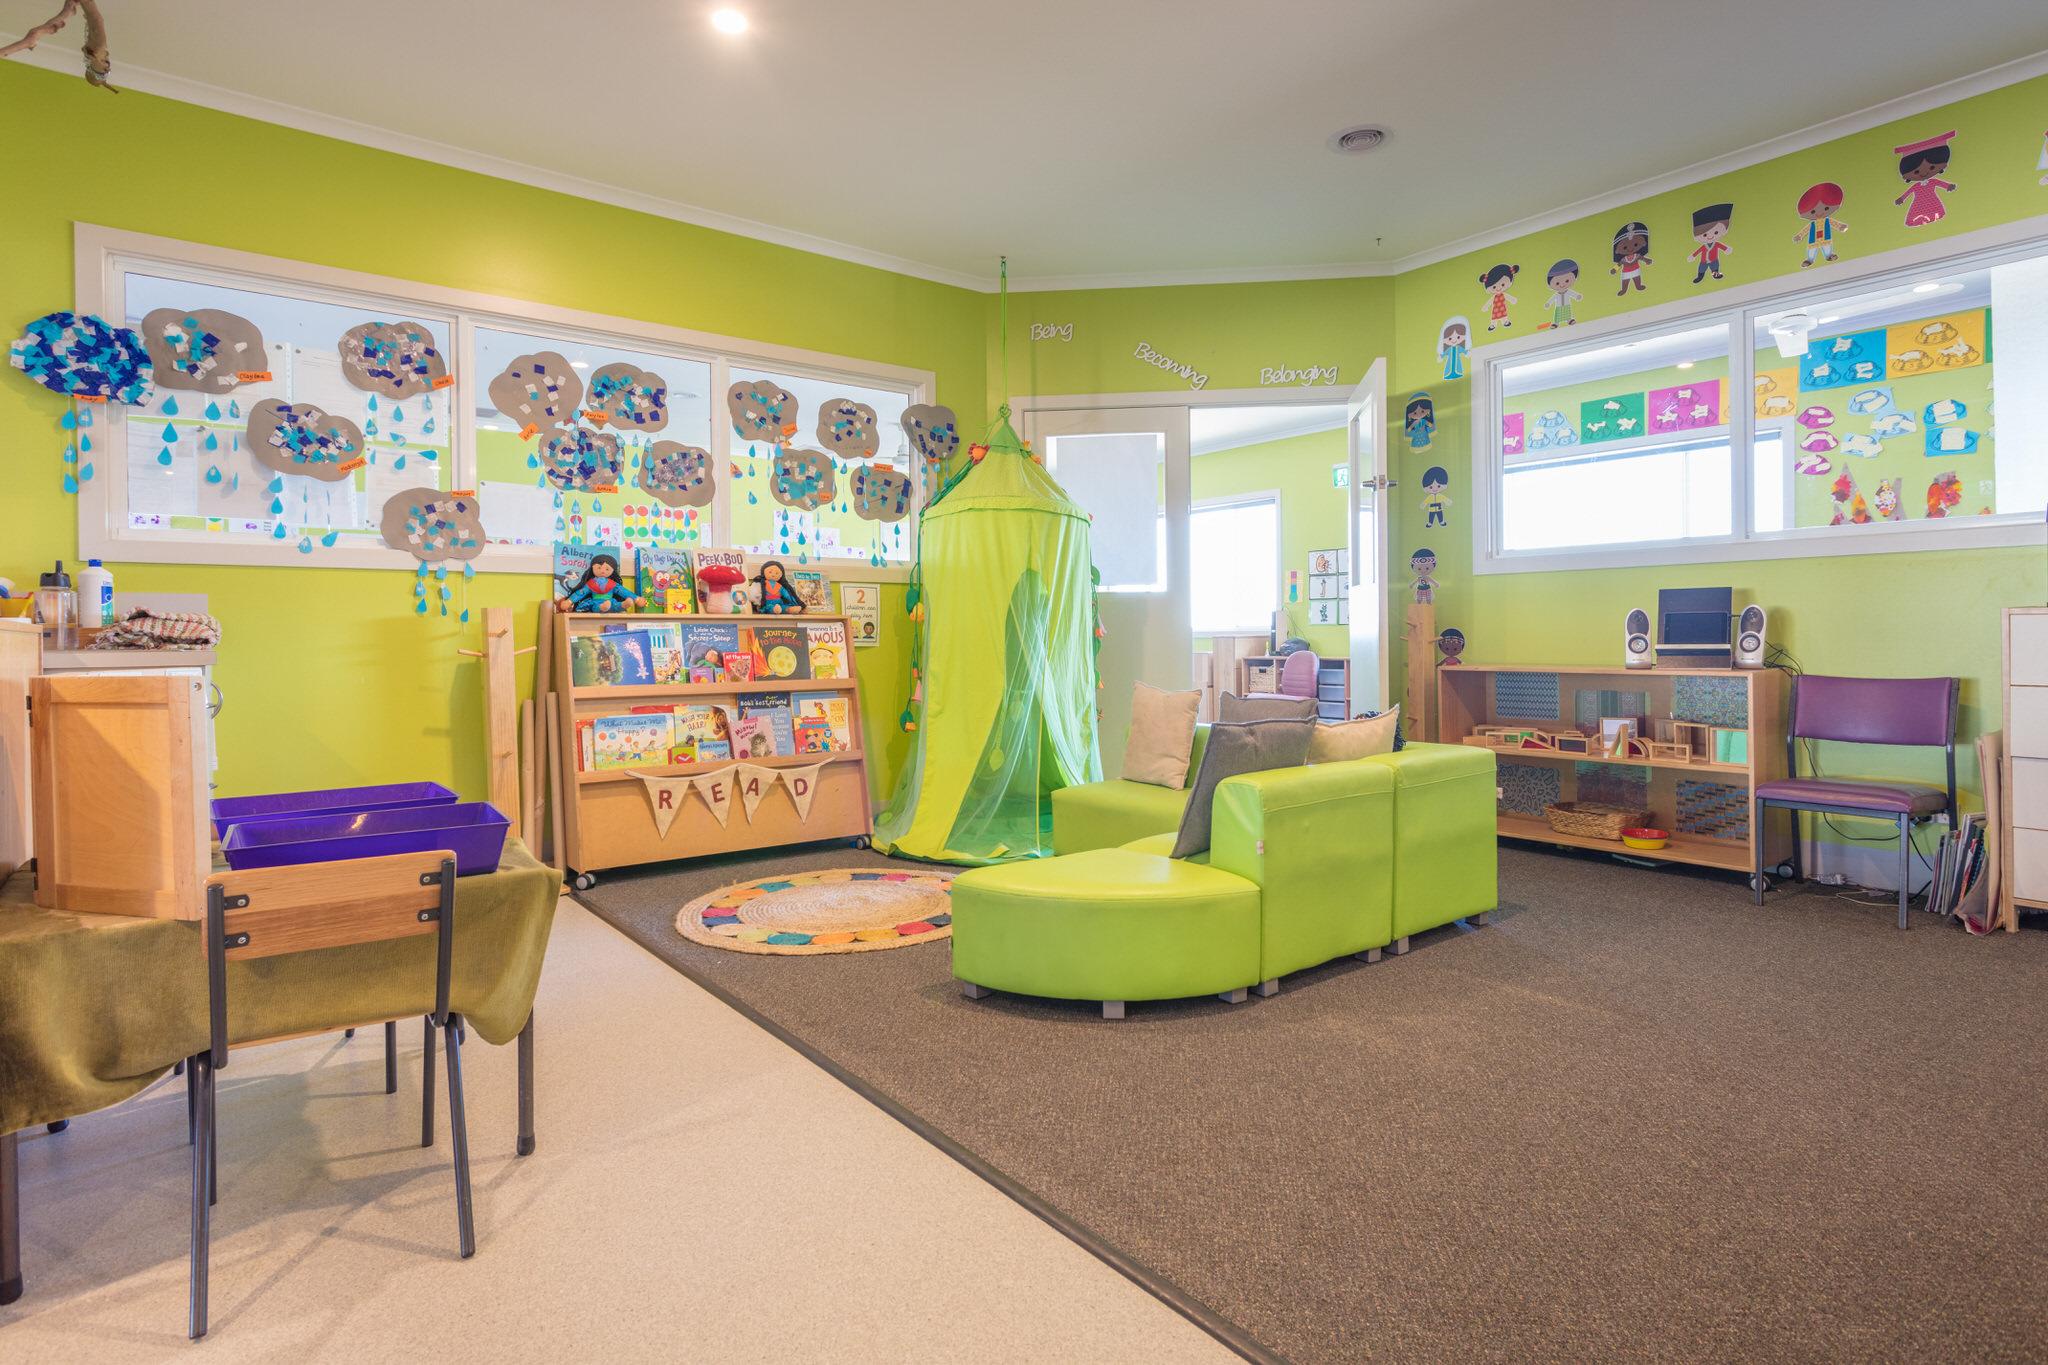 Kangas Room Photo Gallery